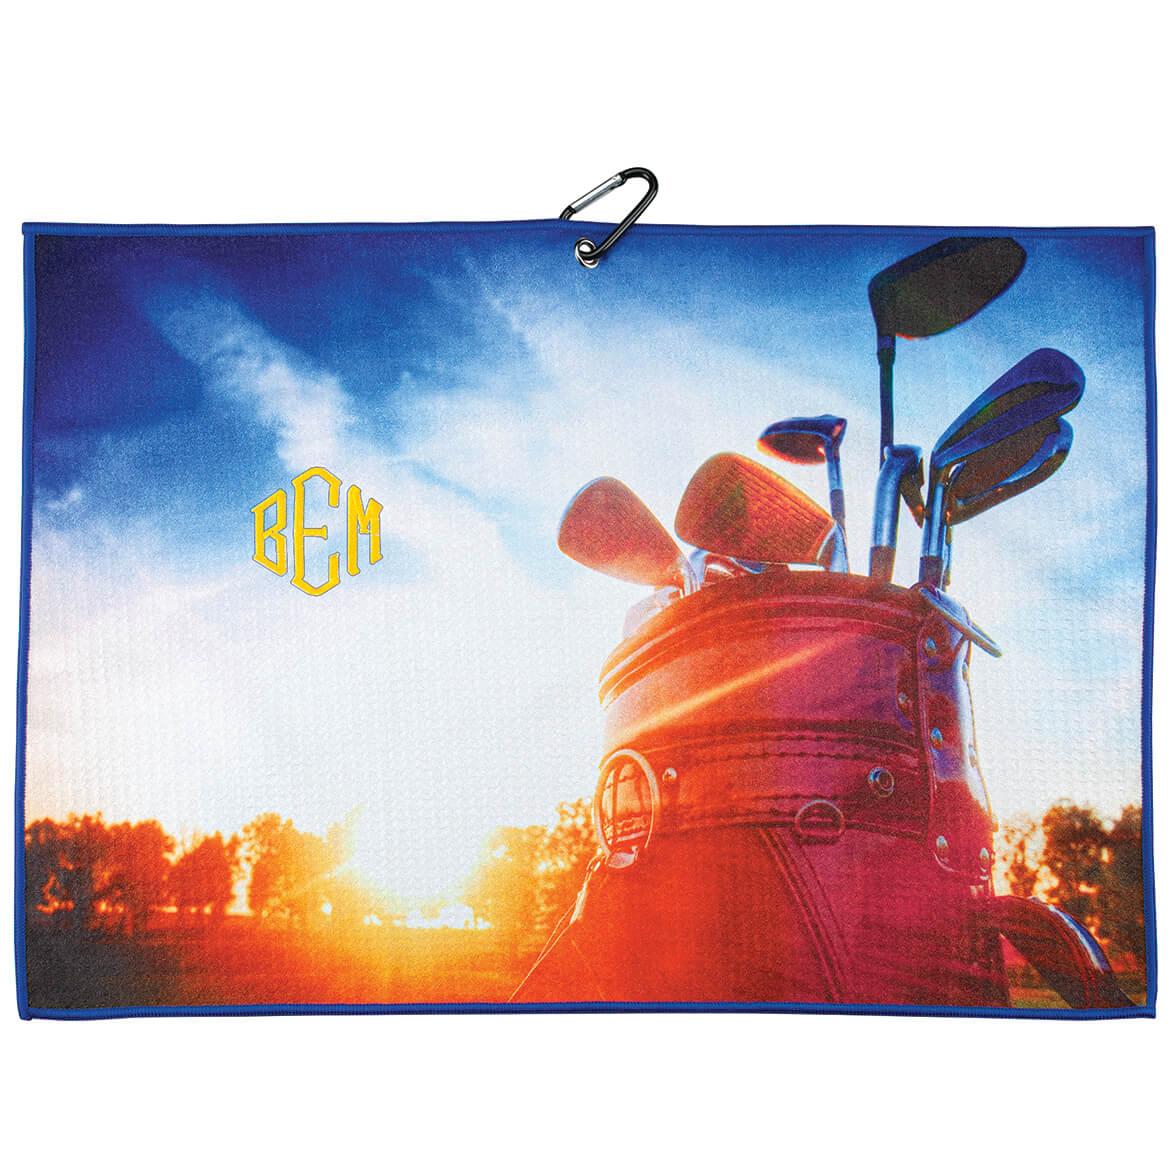 Personalized Horizontal Golf Bag Microfiber Golf Towel-371790